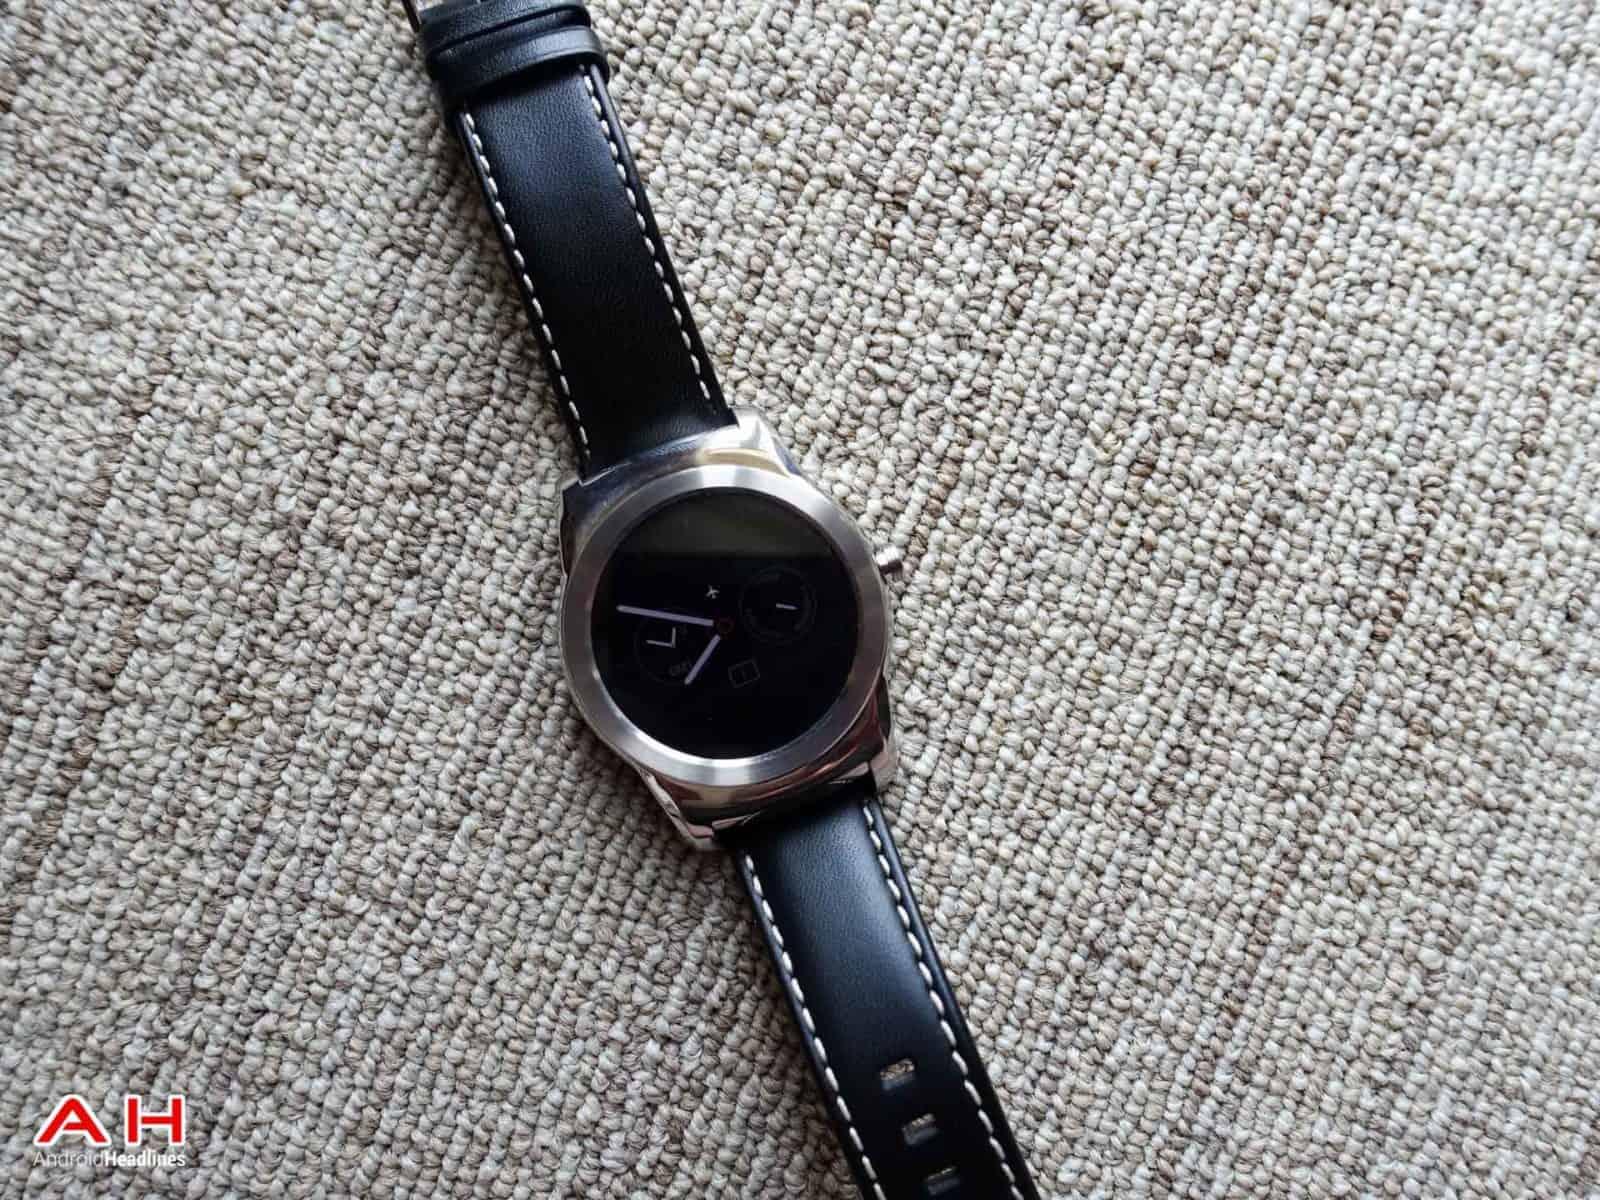 LG-Watch-Urbane-Review-AH-6